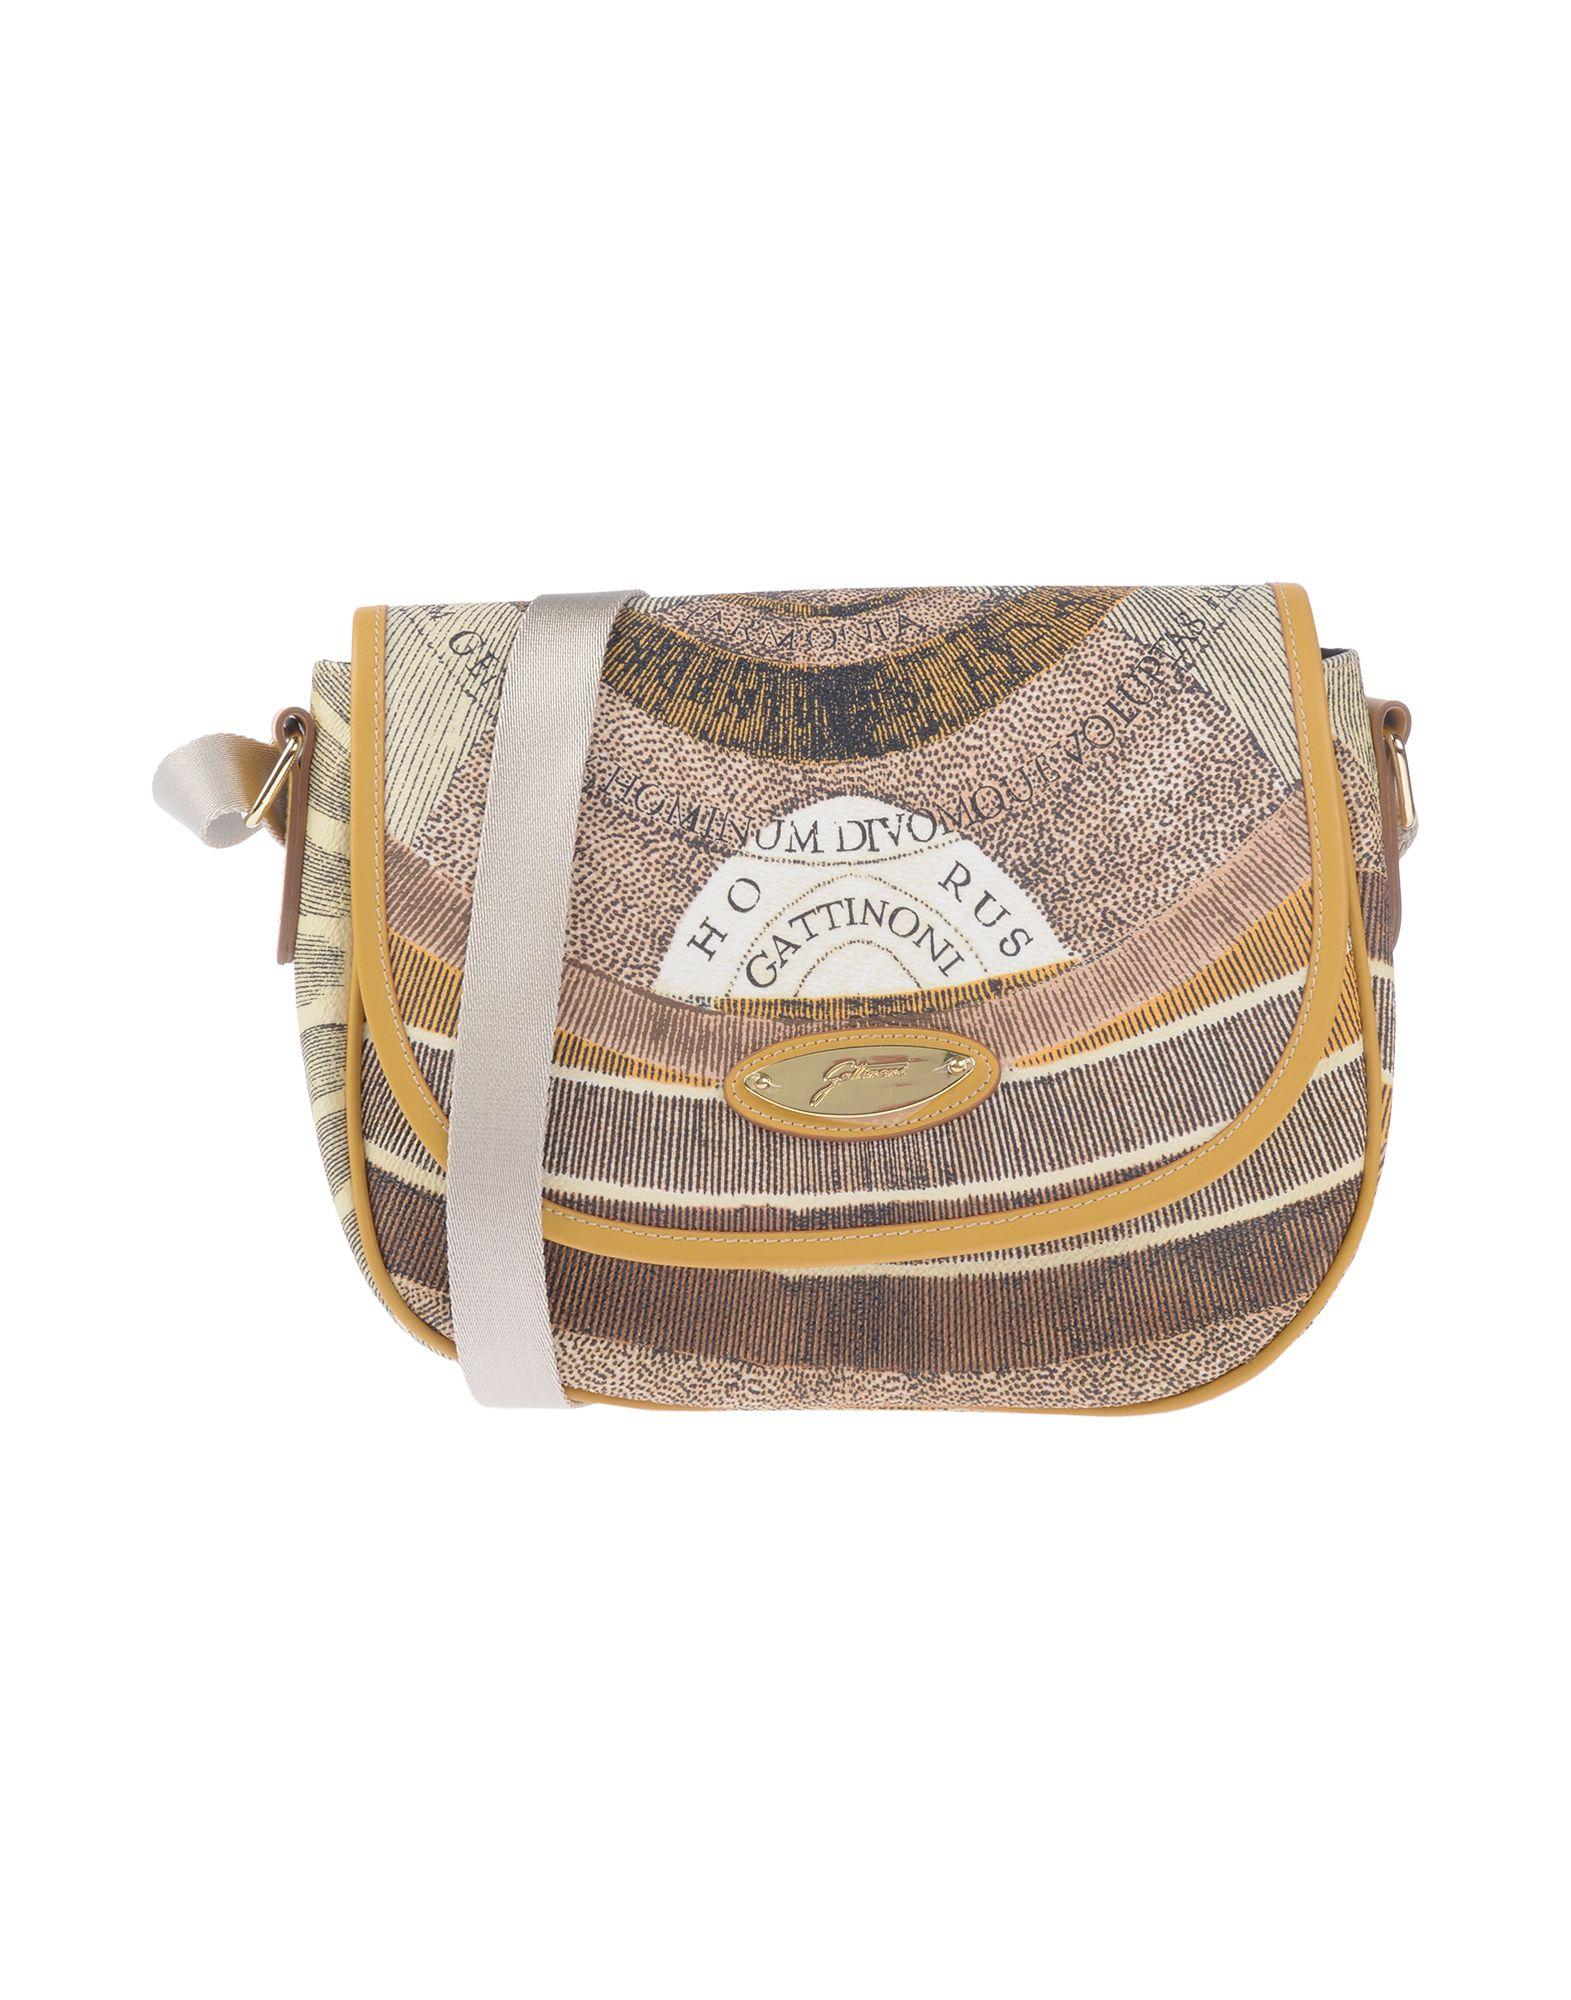 muzee парусиновая мужская сумка через плечо сумка на поясе GATTINONI Сумка через плечо